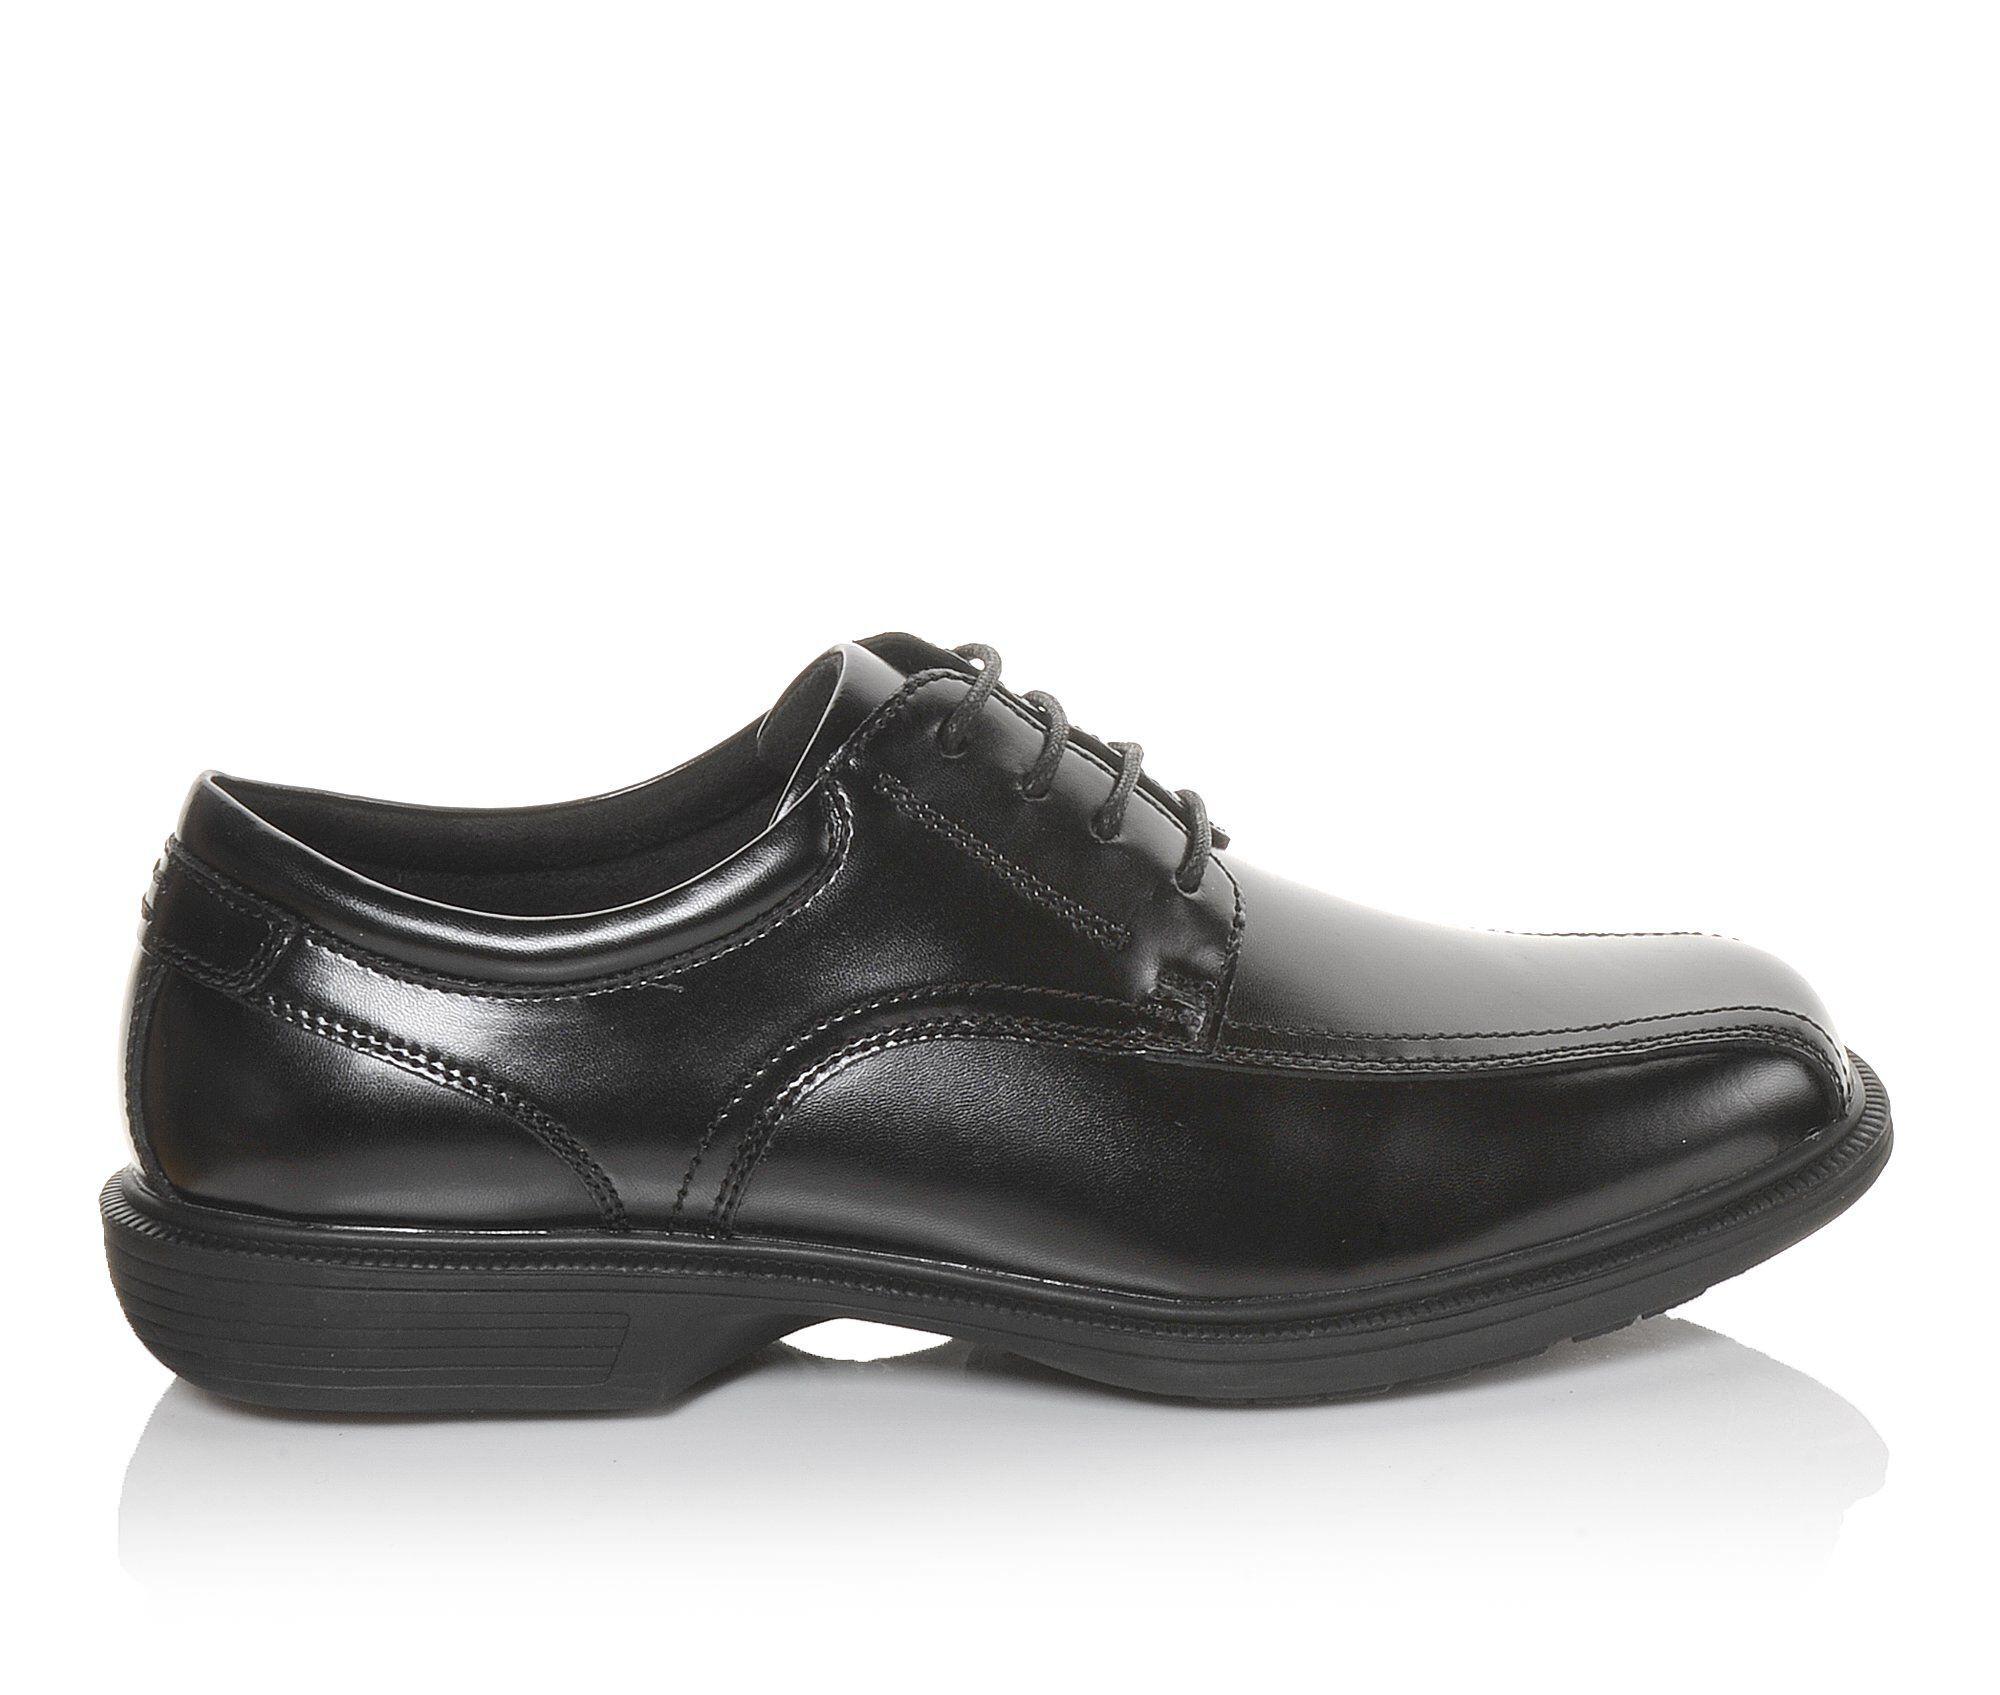 Men's Nunn Bush Bartole Street Dress Shoes Black